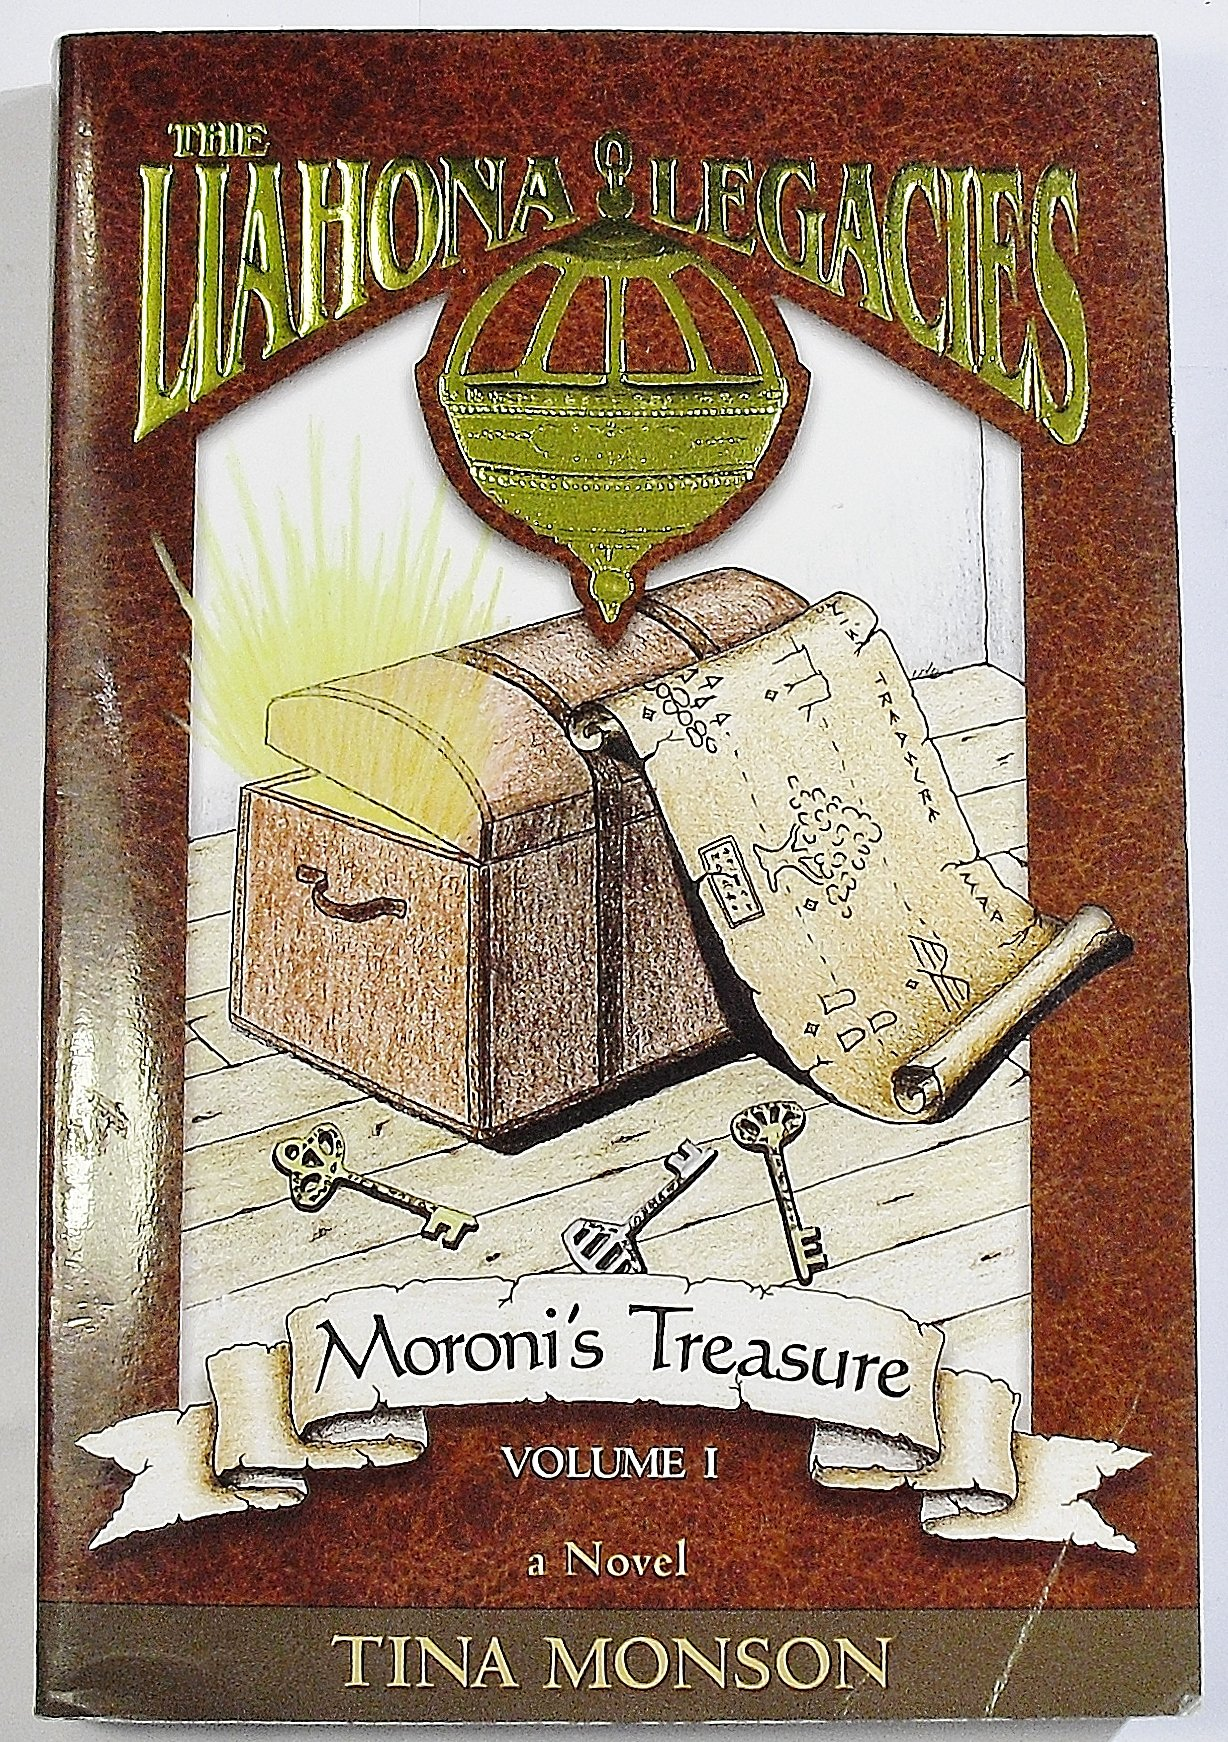 Moroni's Treasure (The Liahona Legacies, Volume 1) Text fb2 book